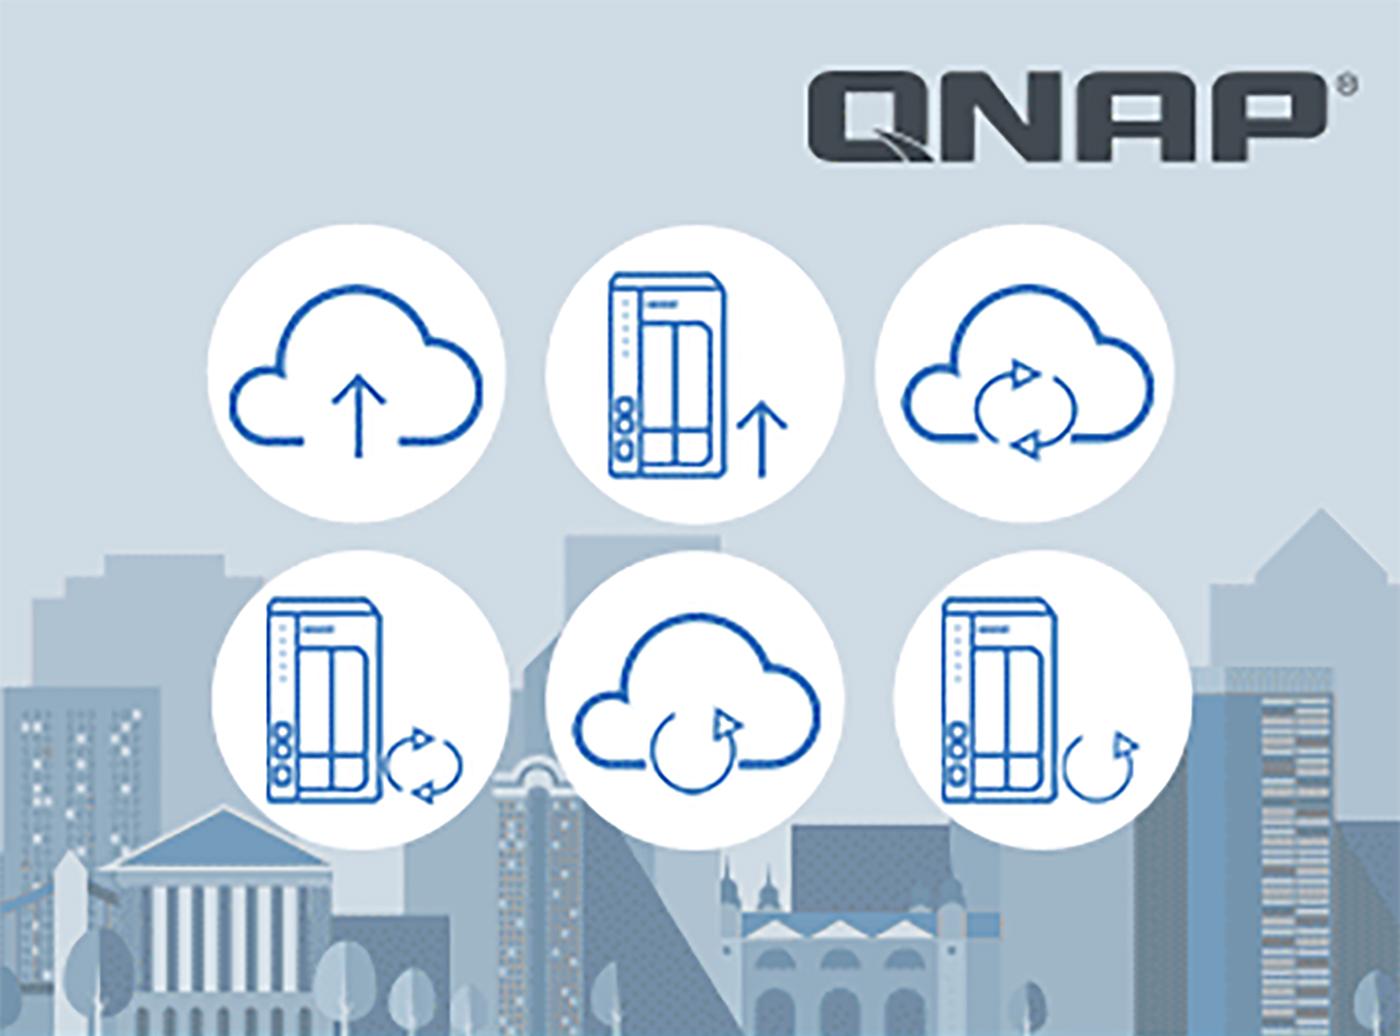 QNAP Hybrid Backup Sync fare backup diventa routine - Digitalic